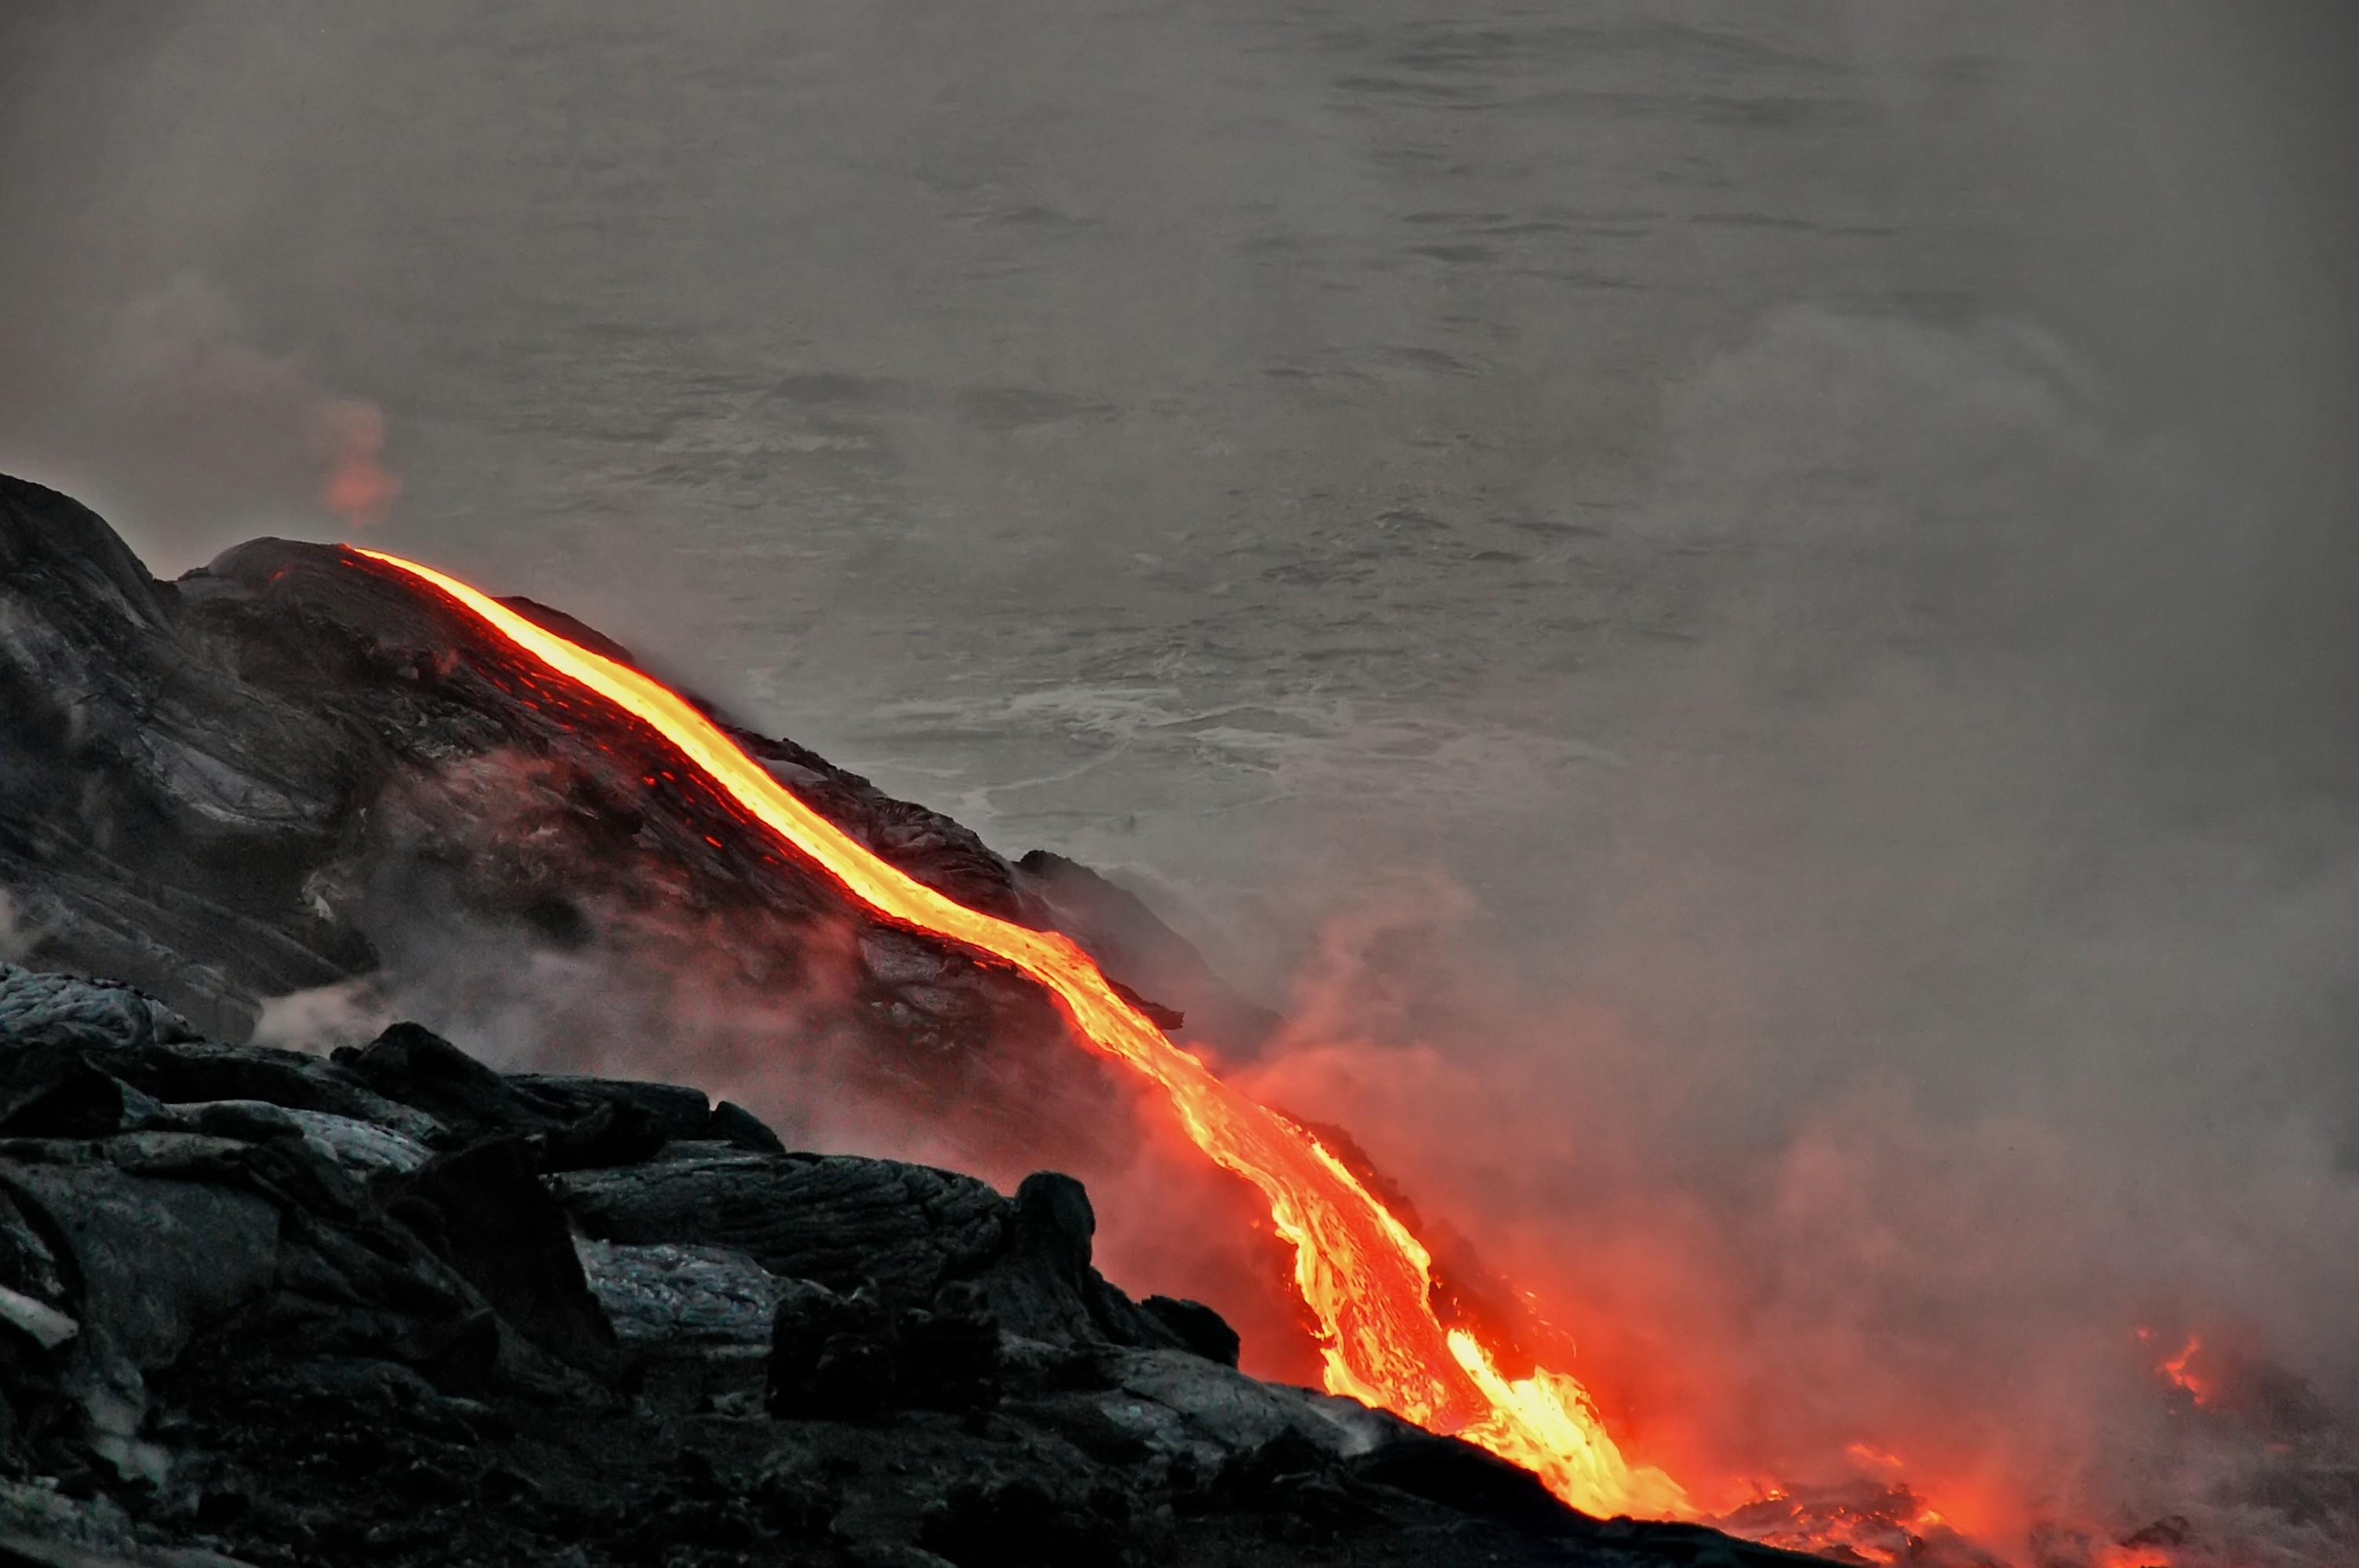 volcanoes national park, hawaii, volcano, lava flow, lava